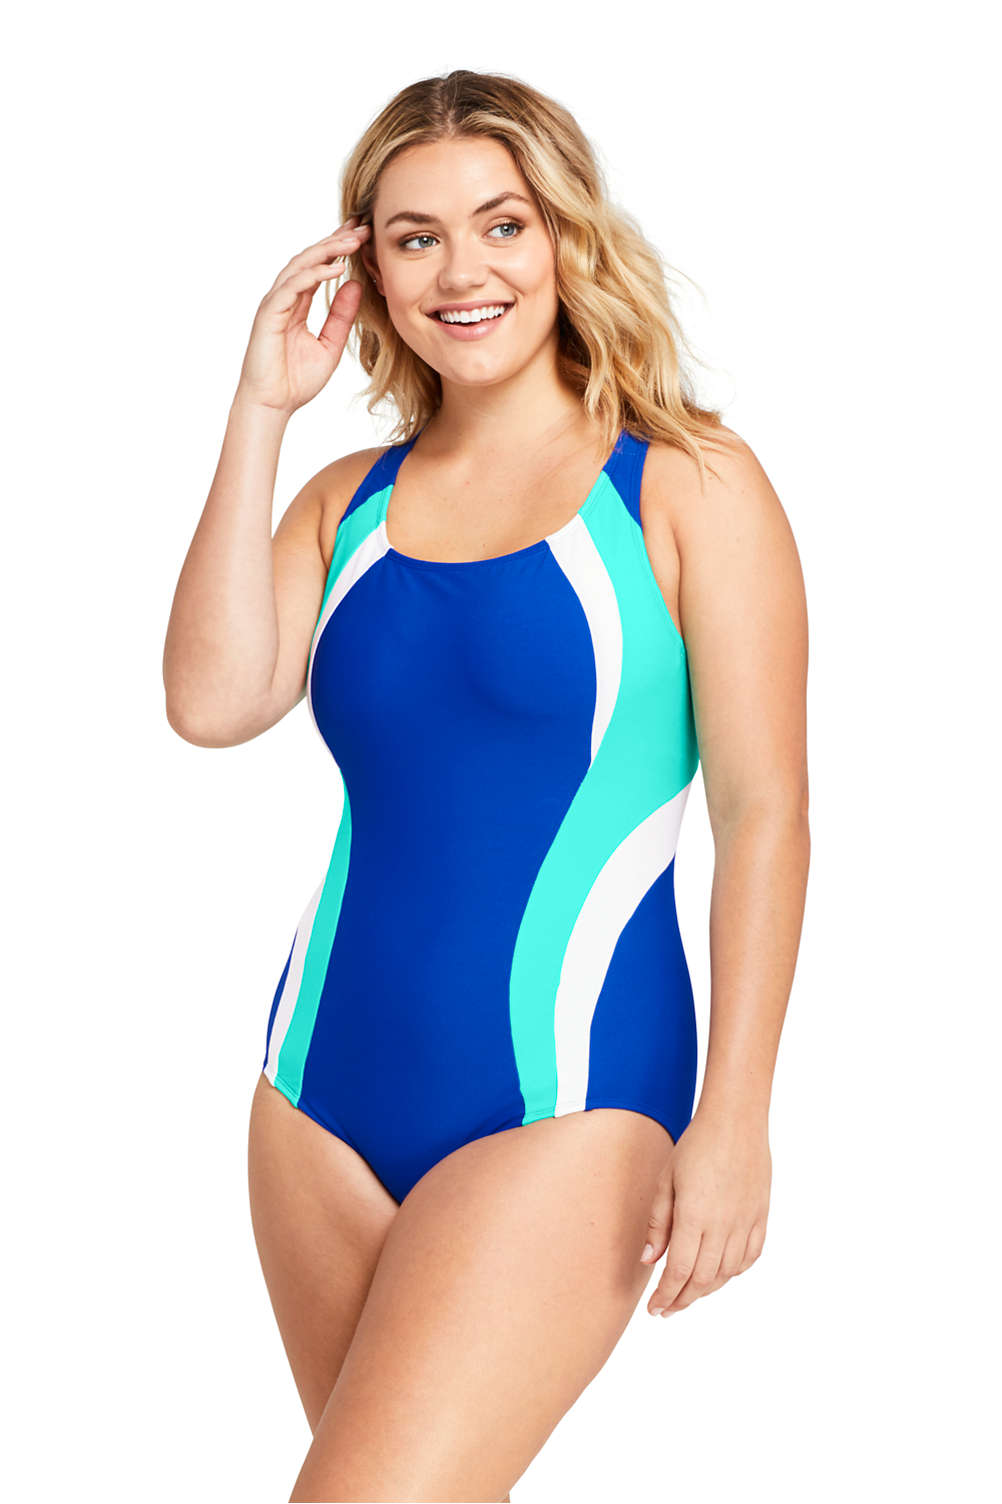 1358de0af Women s Plus Size Chlorine Resistant Square Neck One Piece Swimsuit from  Lands  End